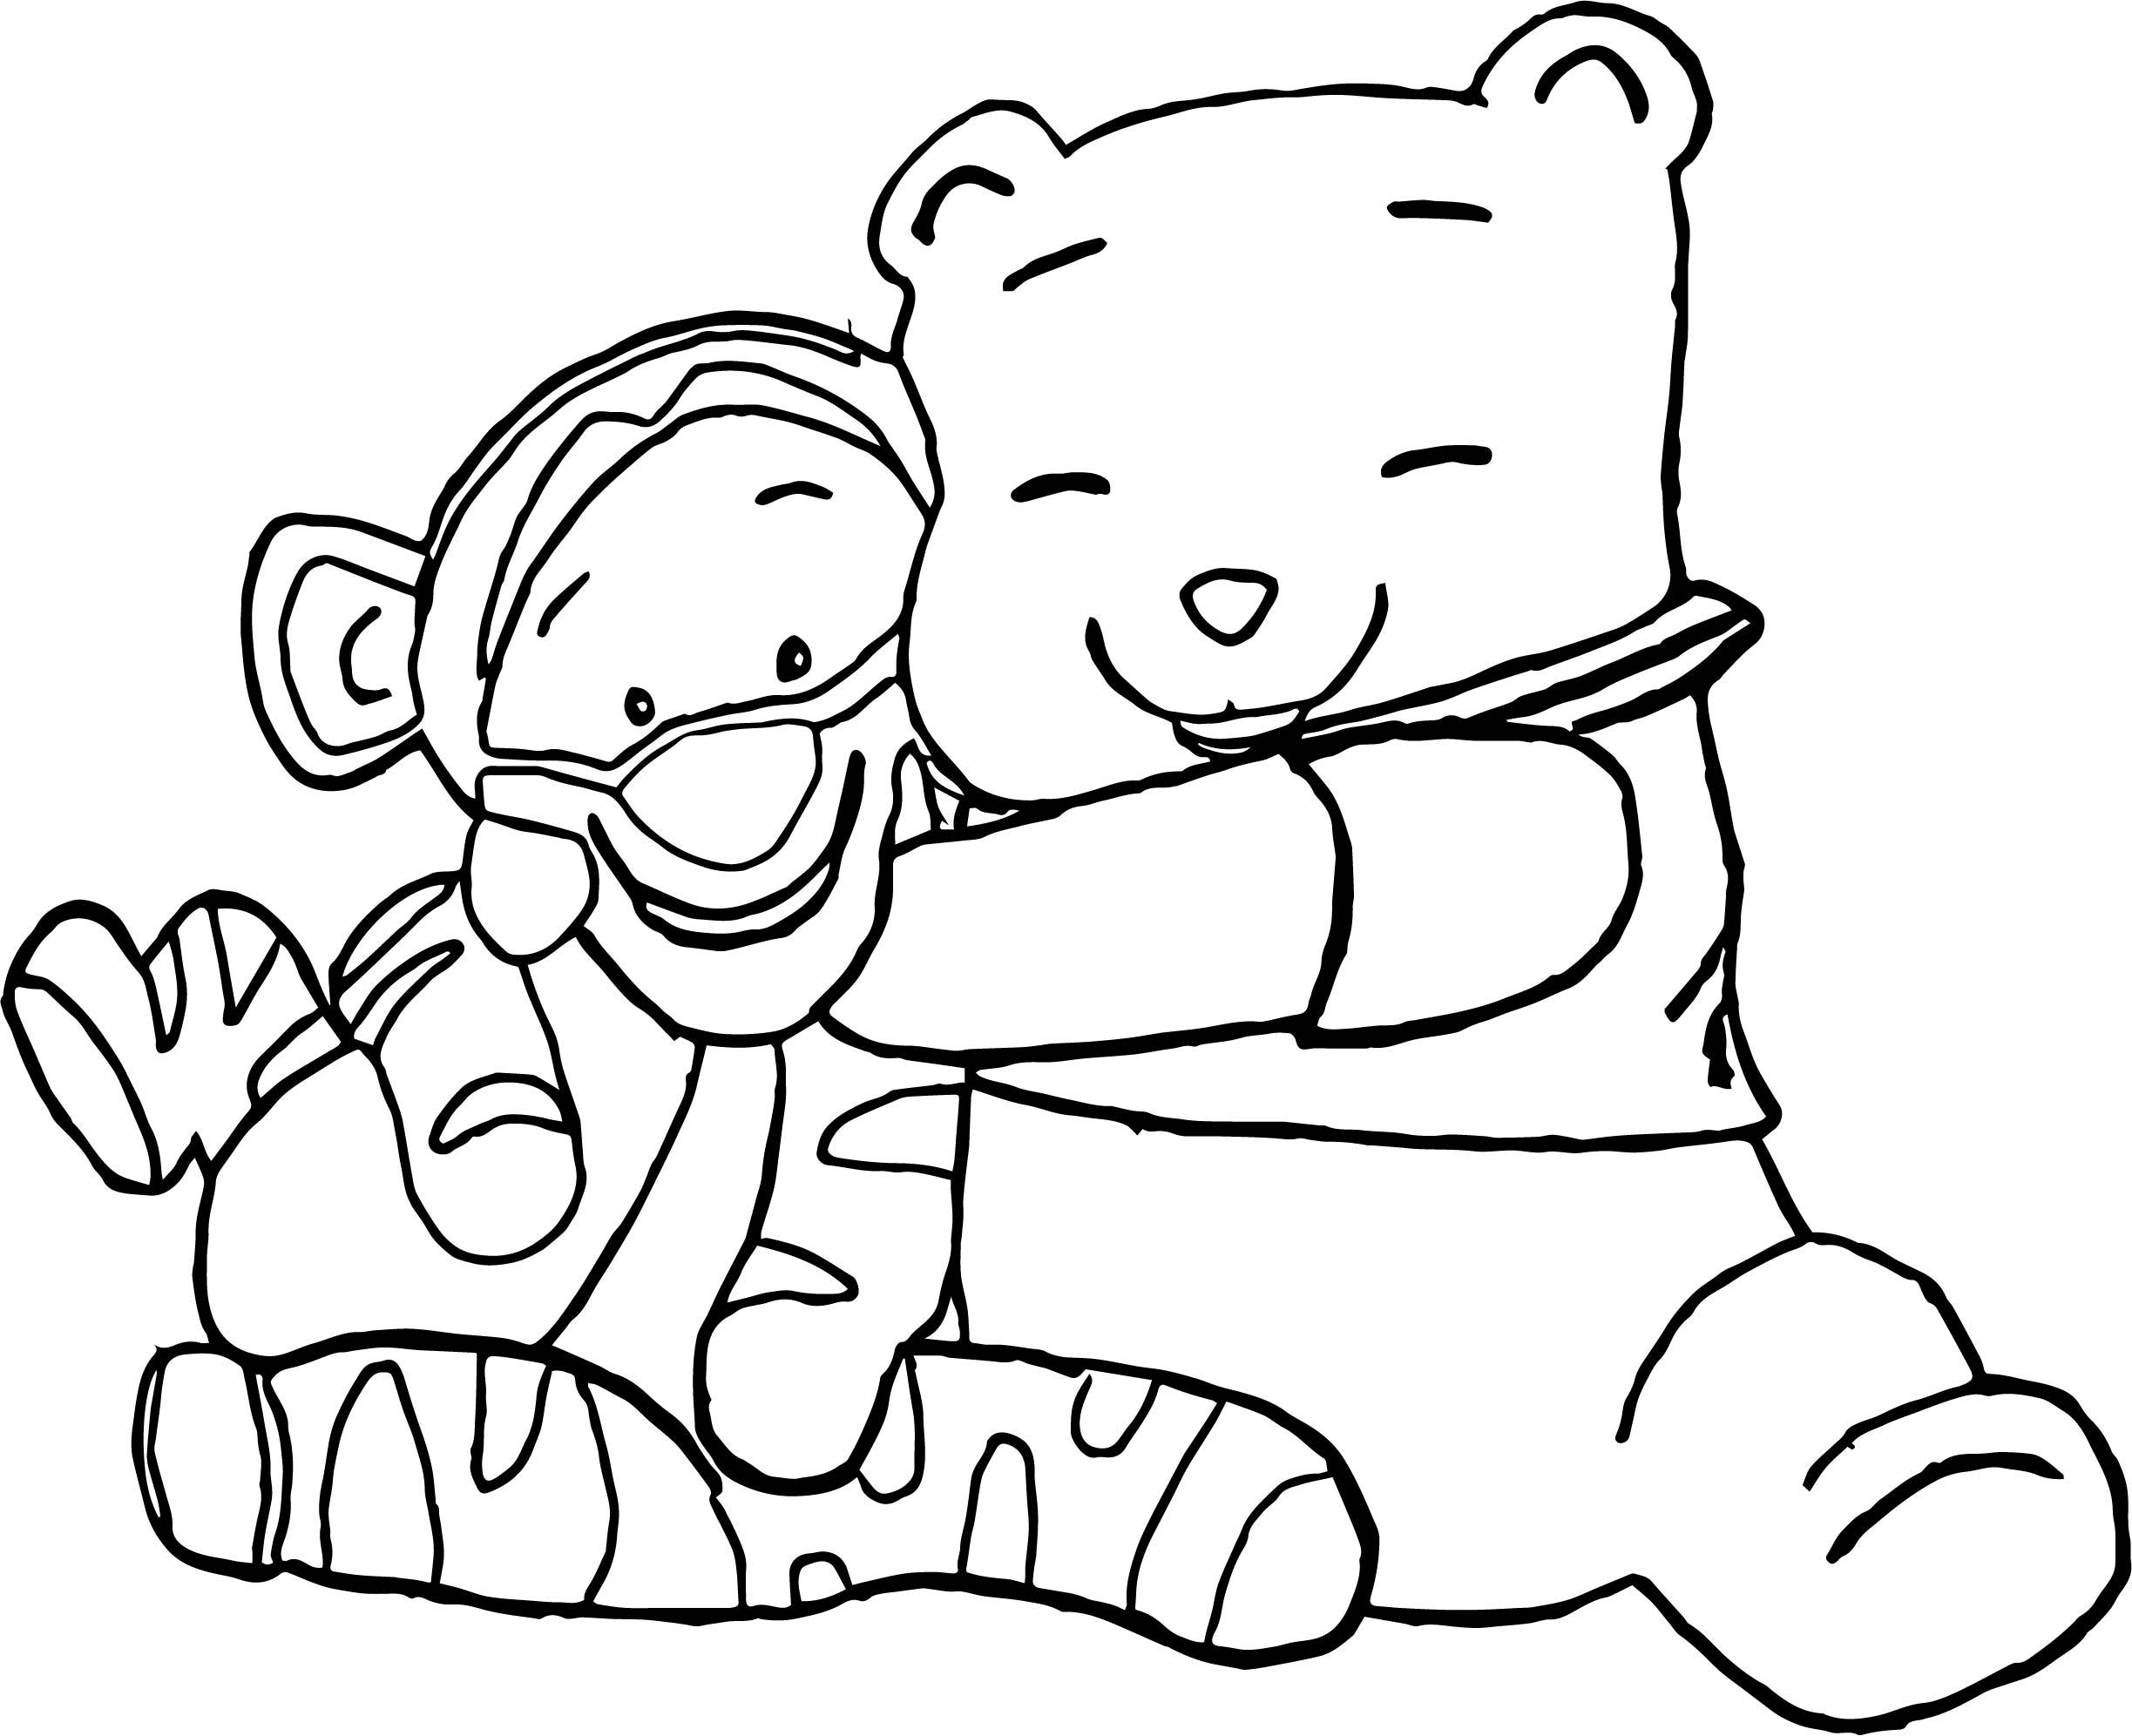 Baby Tigger Winnie The Pooh Hug Coloring Page